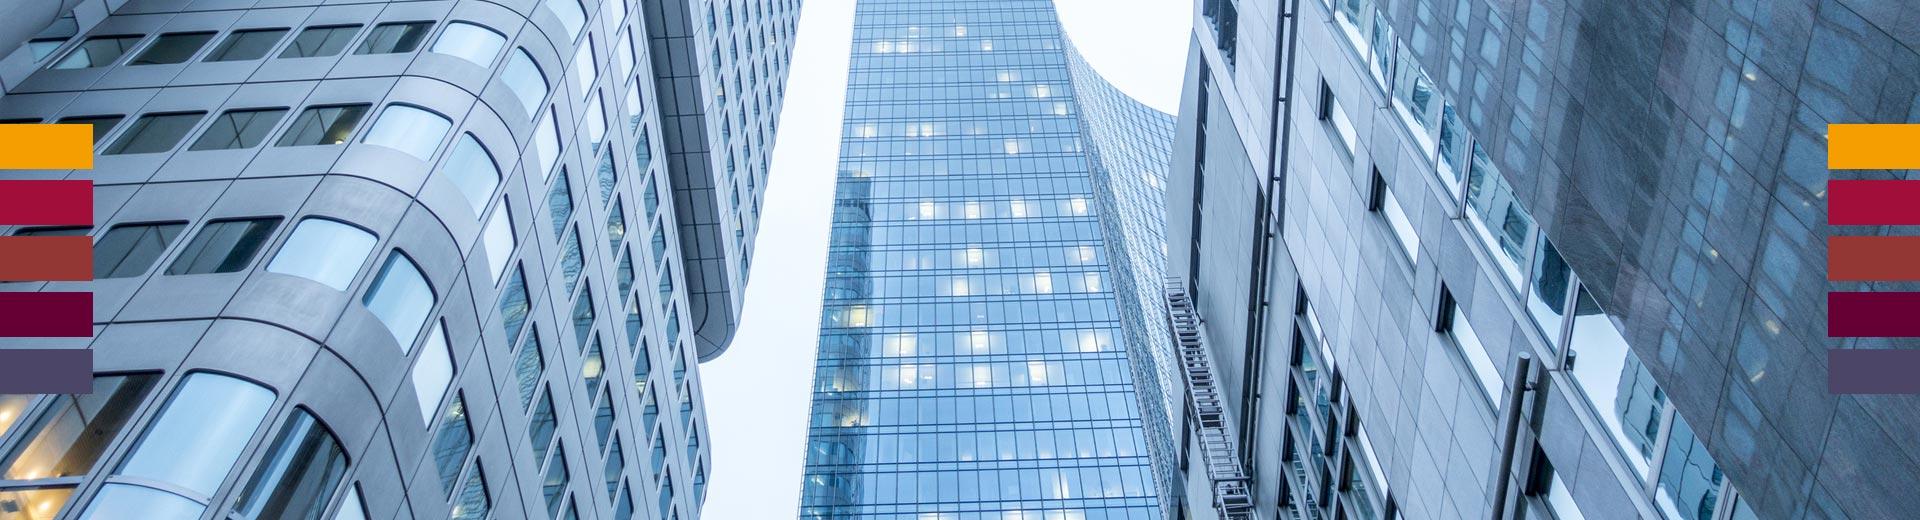 index-Personalmarktstudie-Hessen